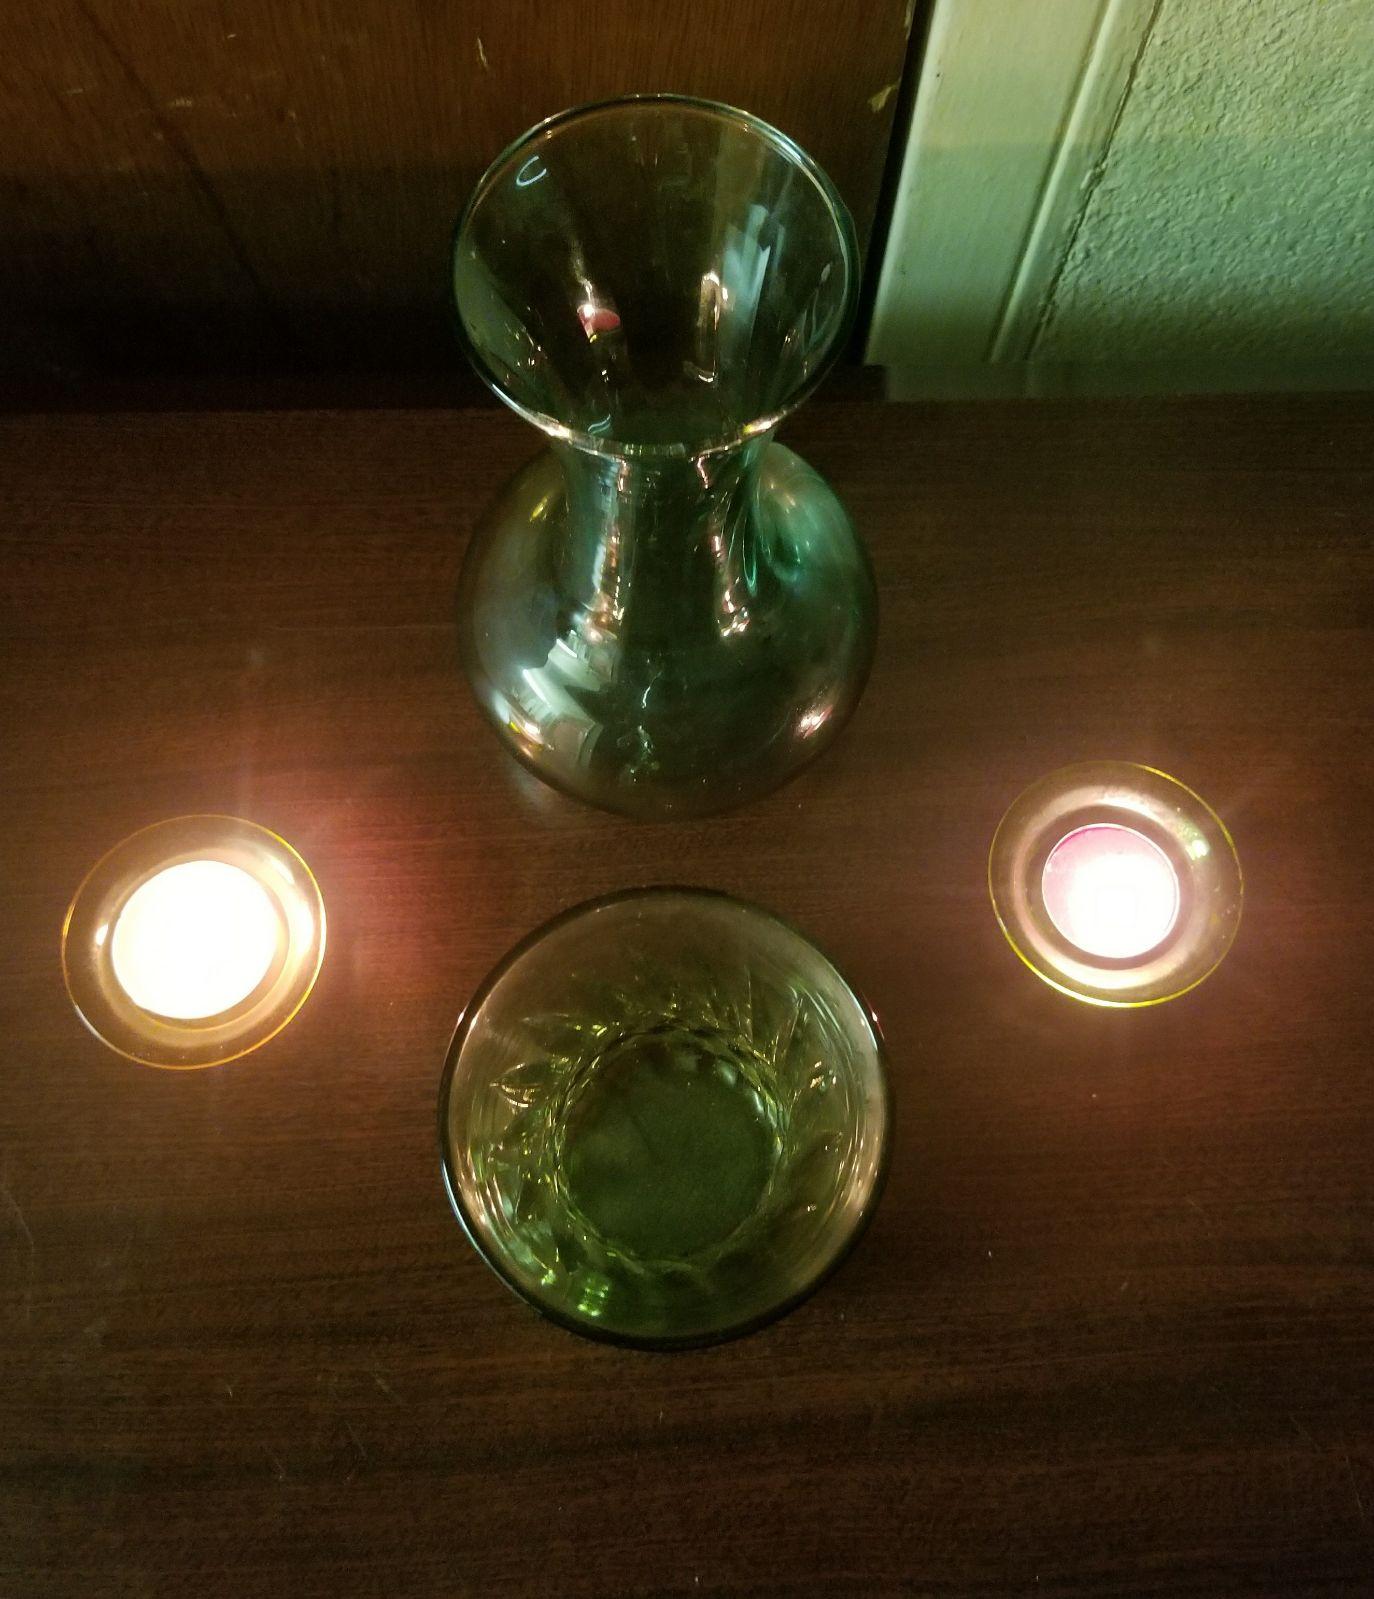 2 green depression glass vases 2 candles mercari buy sell 2 green depression glass vases 2 candles reviewsmspy